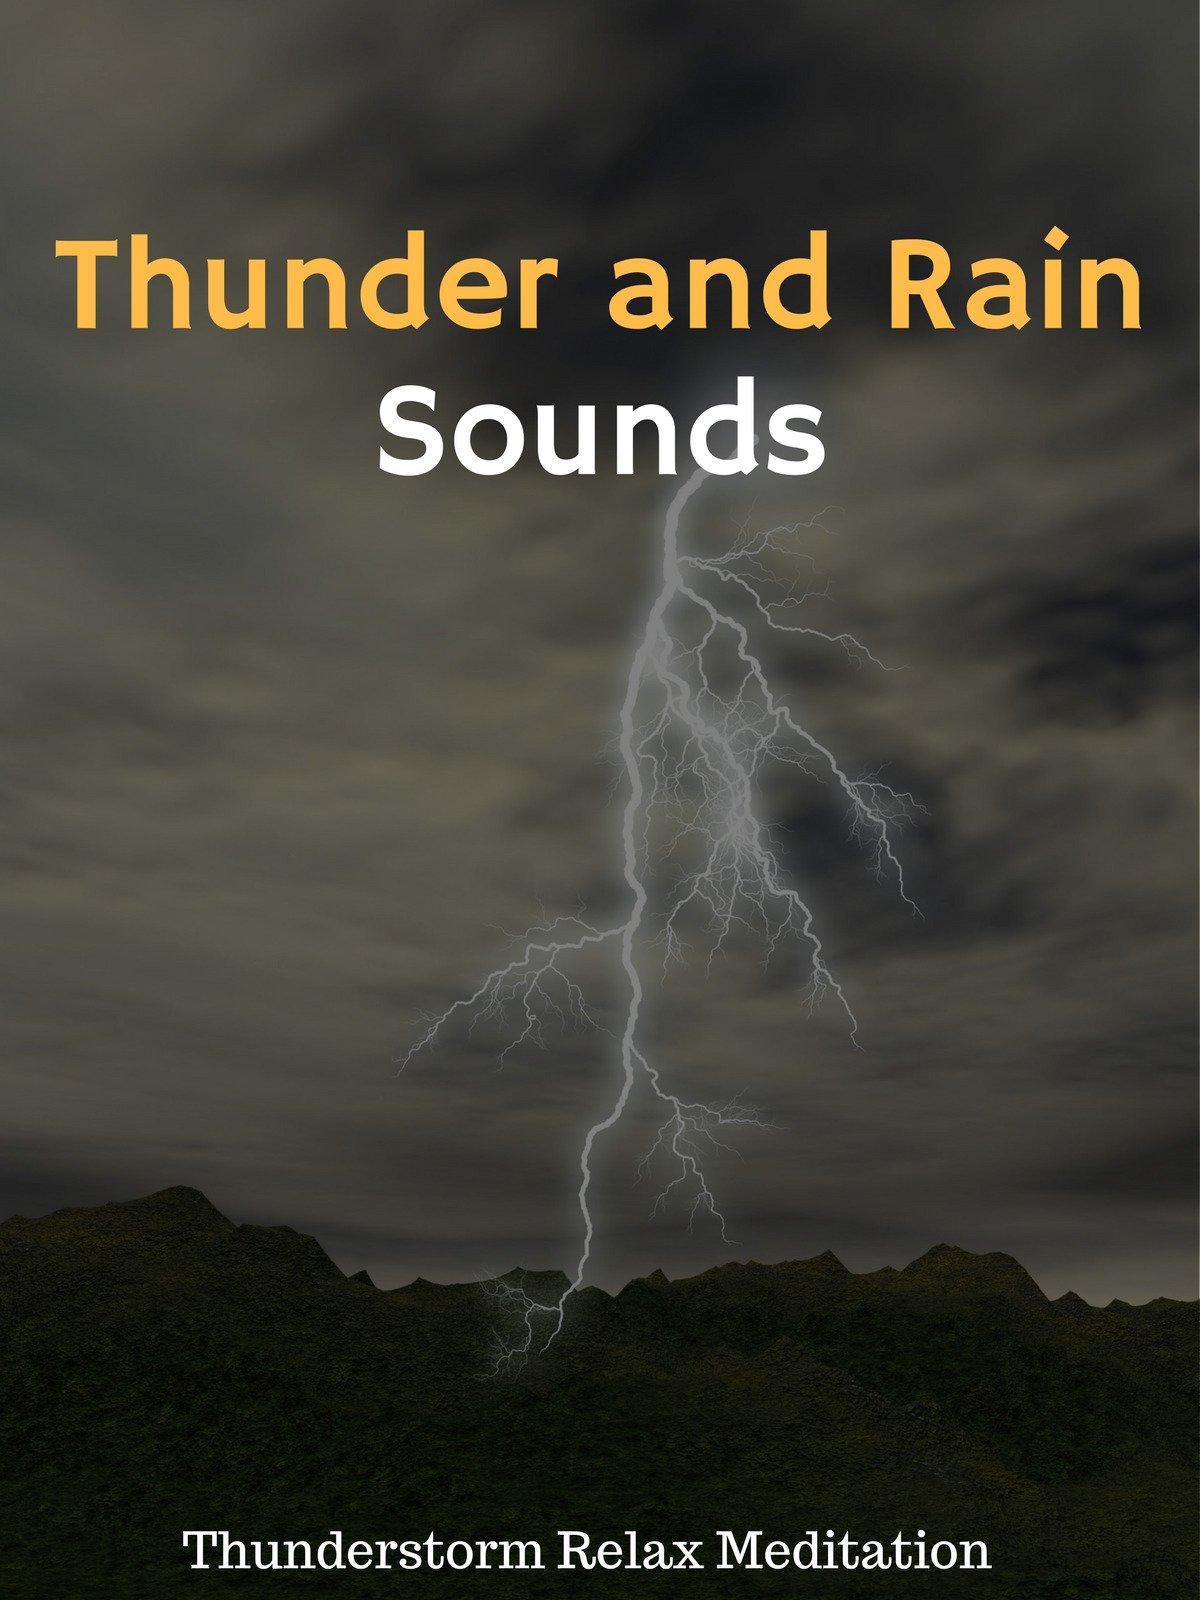 Thunder and Rain Sounds Thunderstorm Relax Meditation